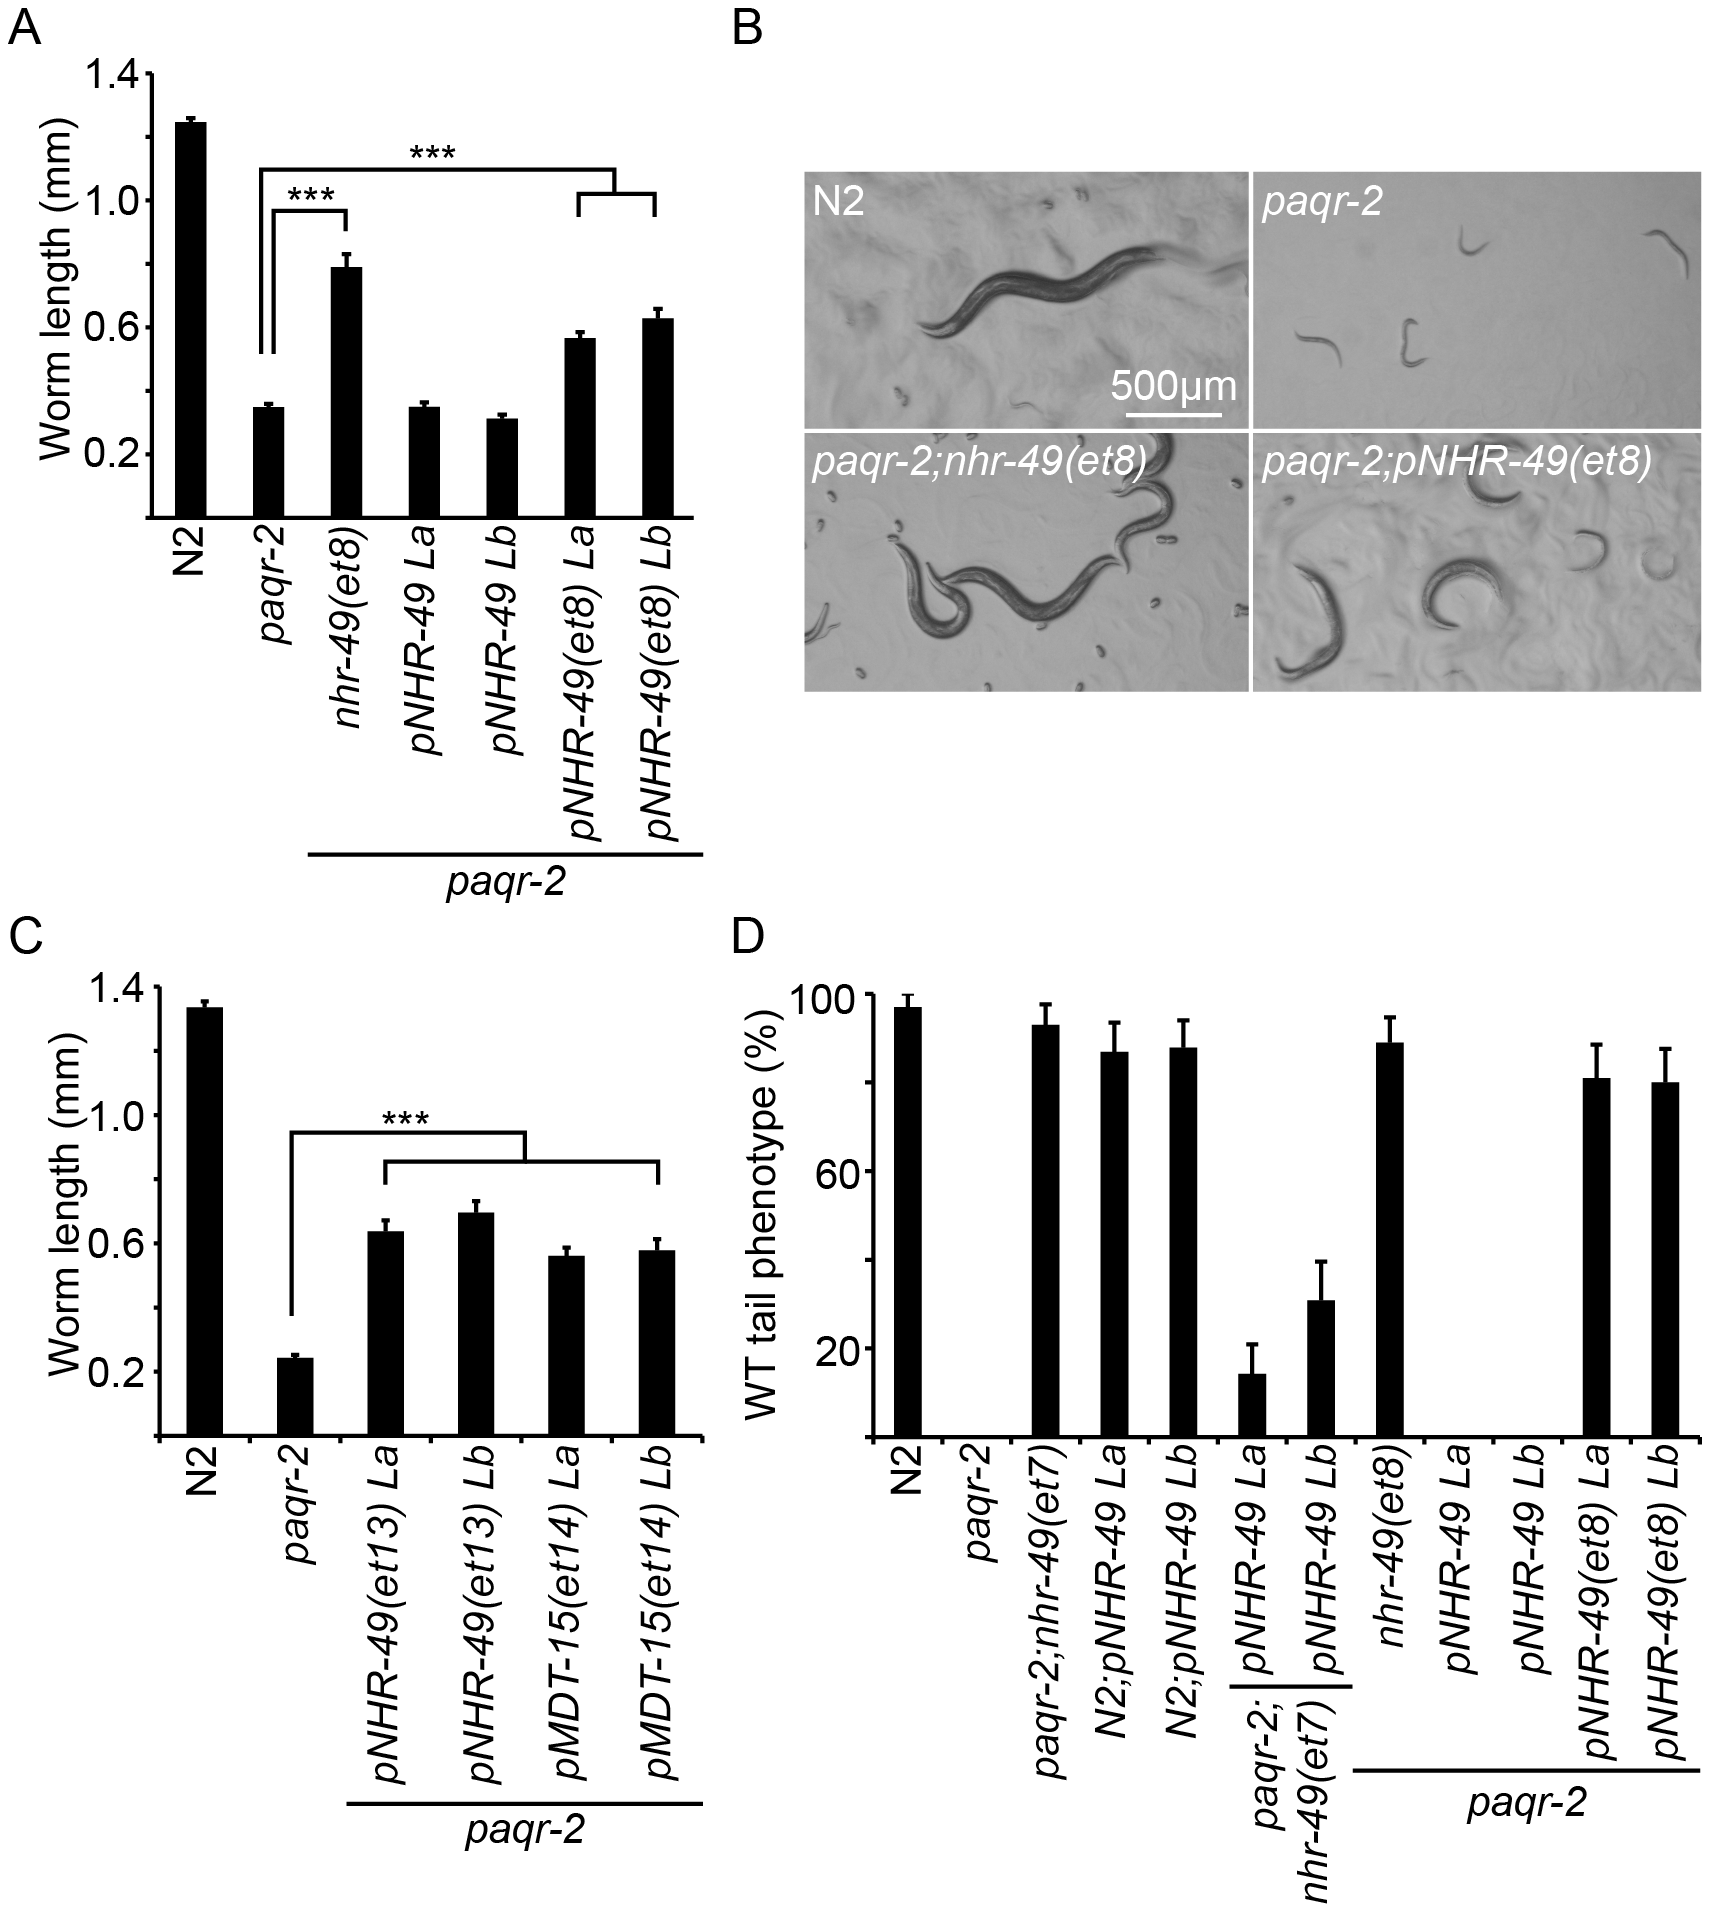 The <i>paqr-2</i> suppressor mutations in <i>nhr-49</i> and <i>mdt-15</i> are <i>gof</i> alleles.